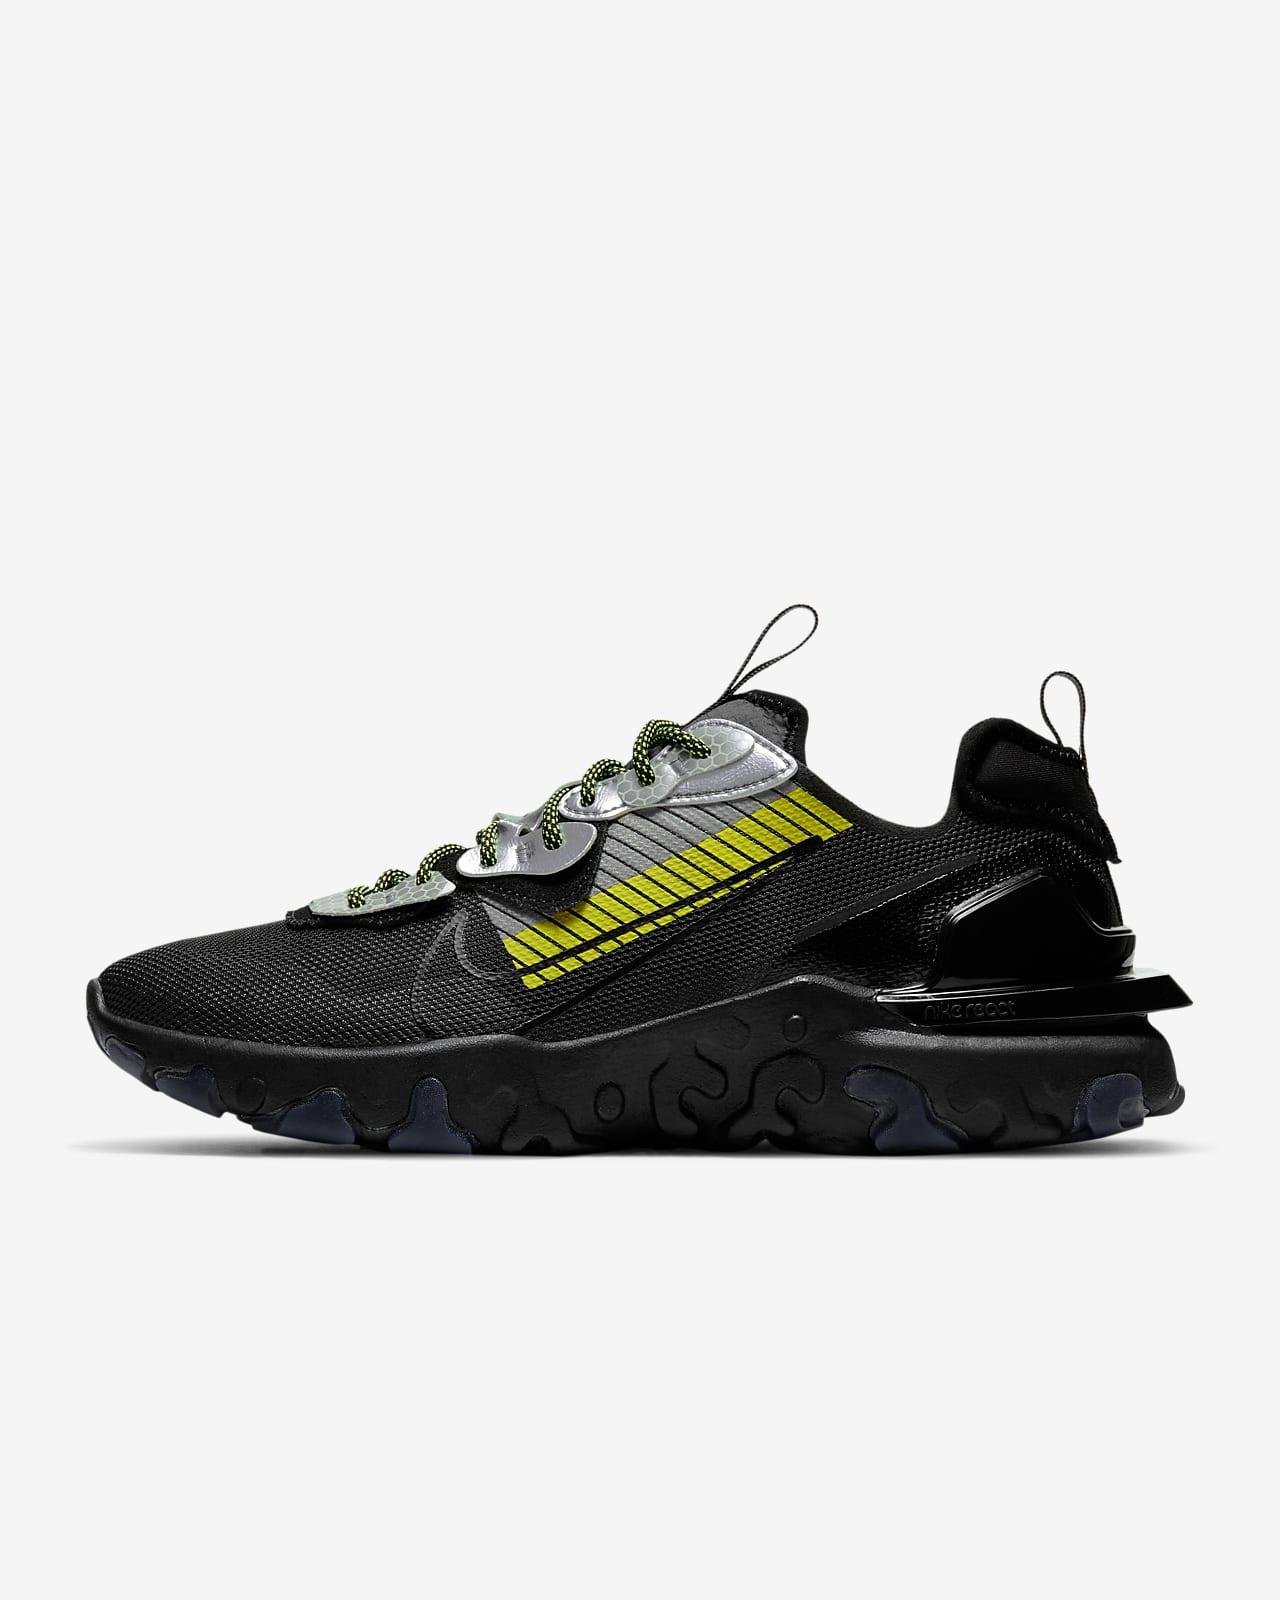 Chaussure Nike React Vision PRM 3M™ pour Homme. Nike LU